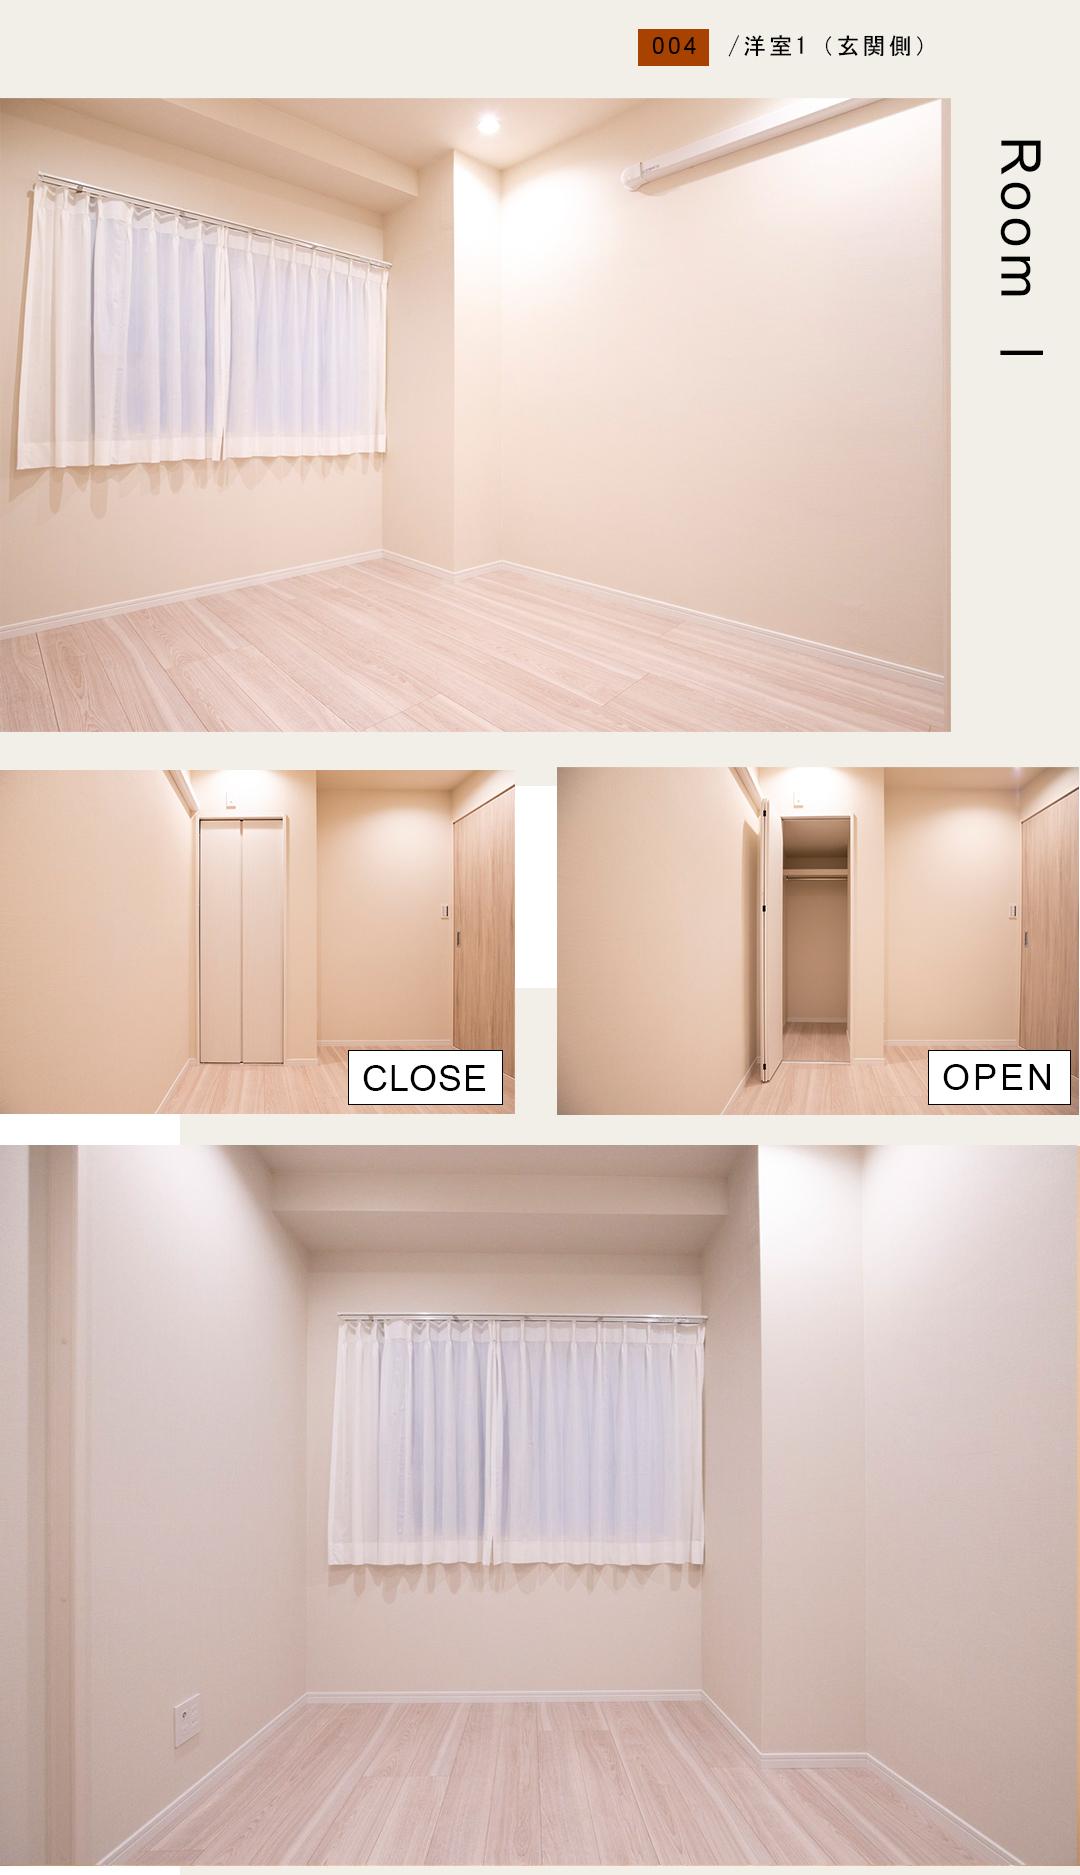 004洋室1(玄関側),RoomⅠ